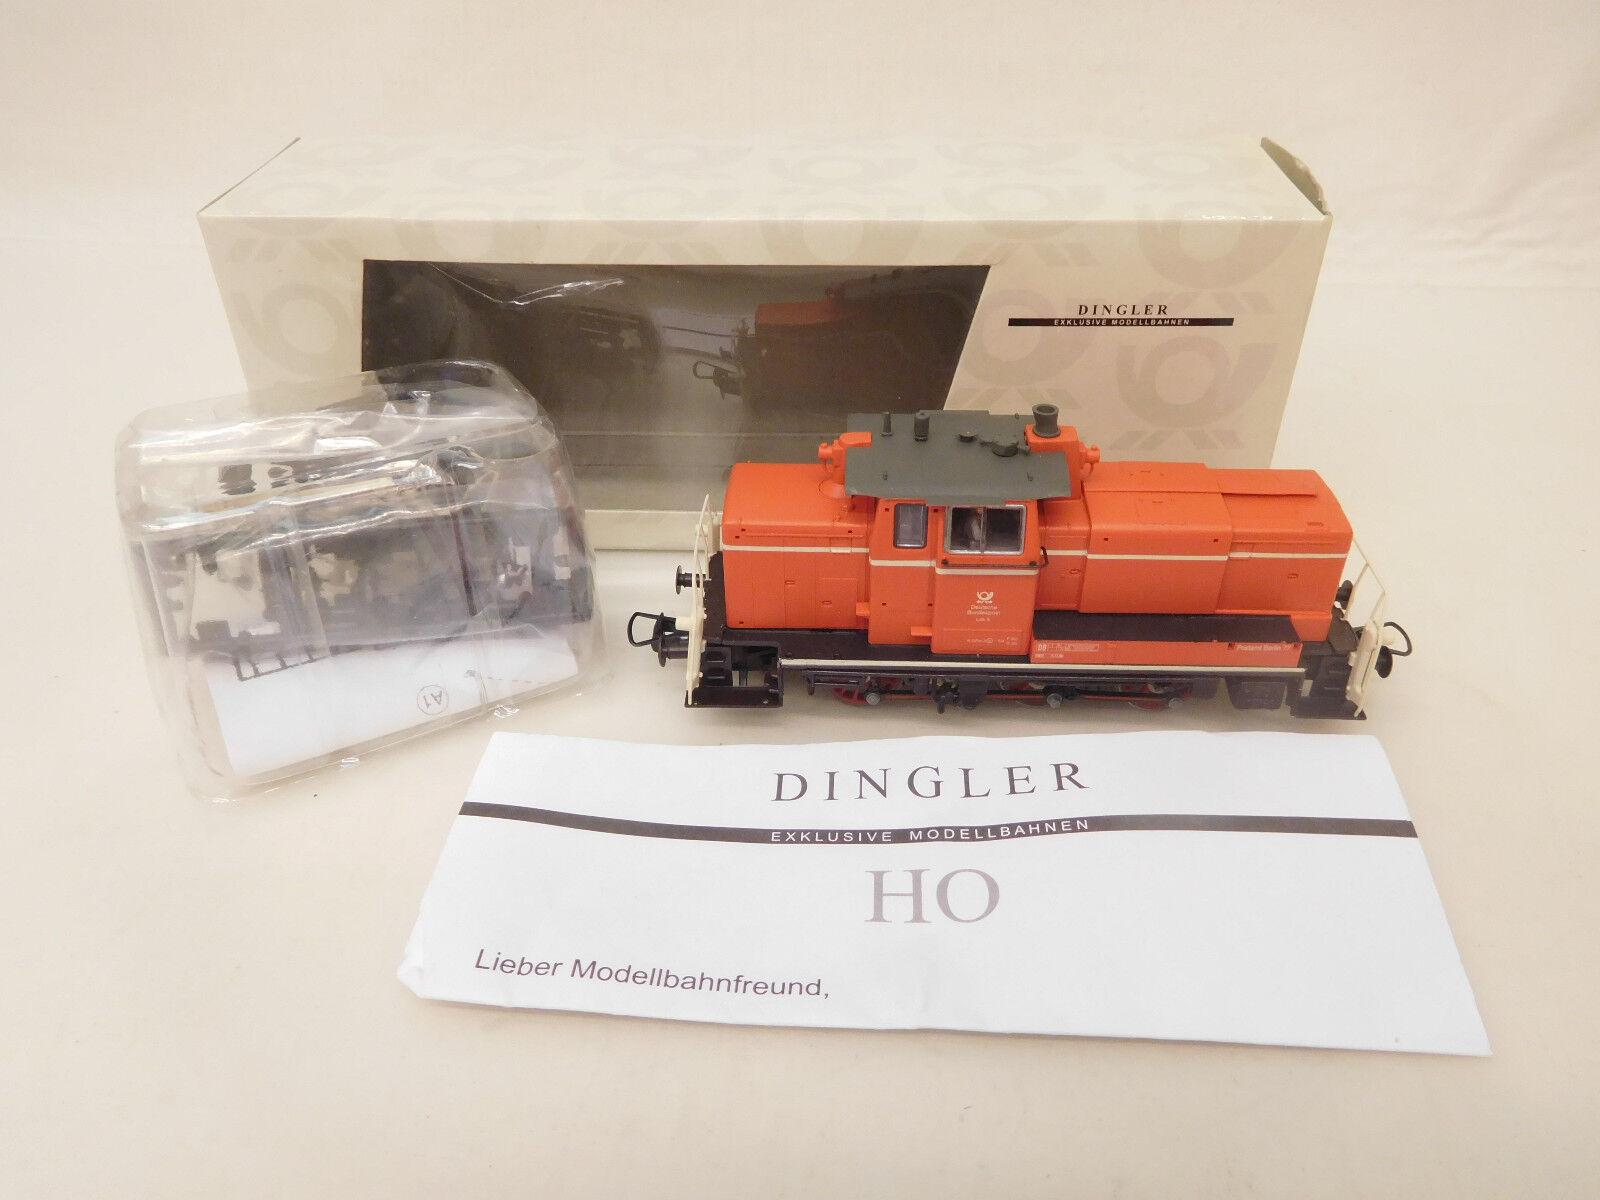 Mes-59779 Dingler 006742 h0 DIESEL DB Lok 5 ottime condizioni